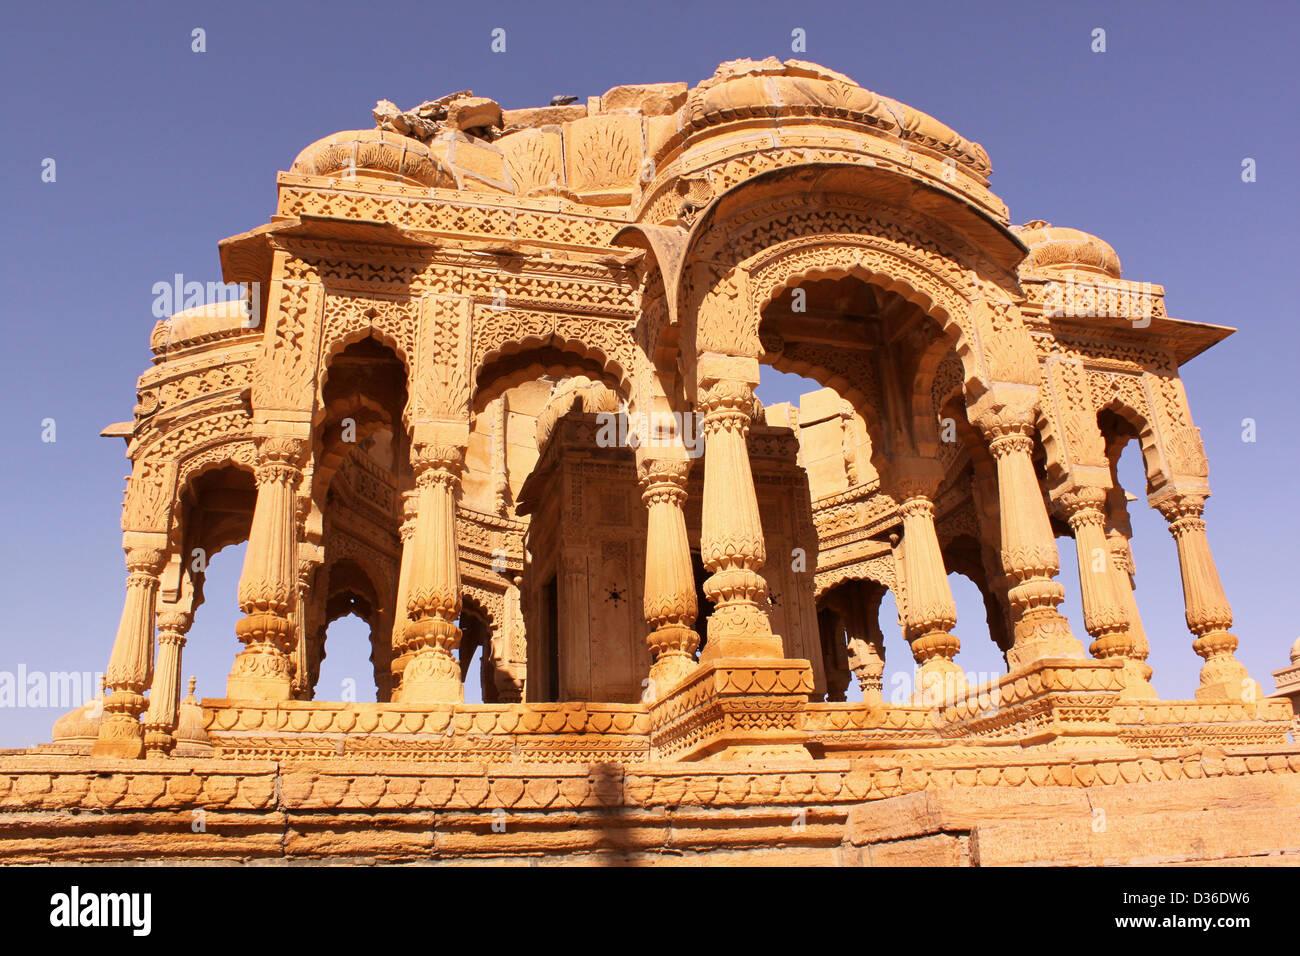 Royal Chhatris or cenotaph of Bada Bagh Jaisalmer Rajasthan India - Stock Image